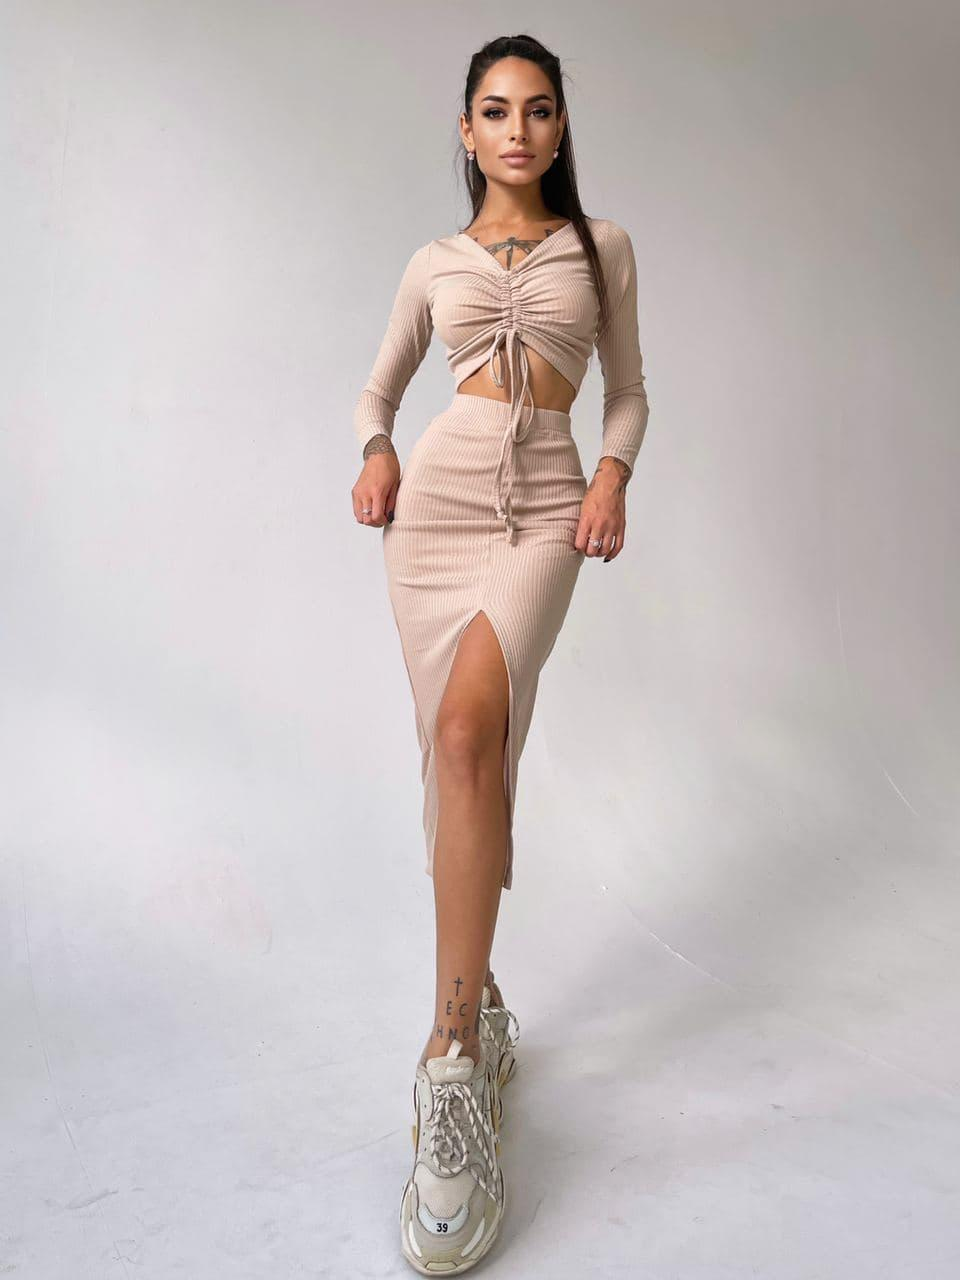 Женский костюм топ+ юбка миди с разрезом Beige